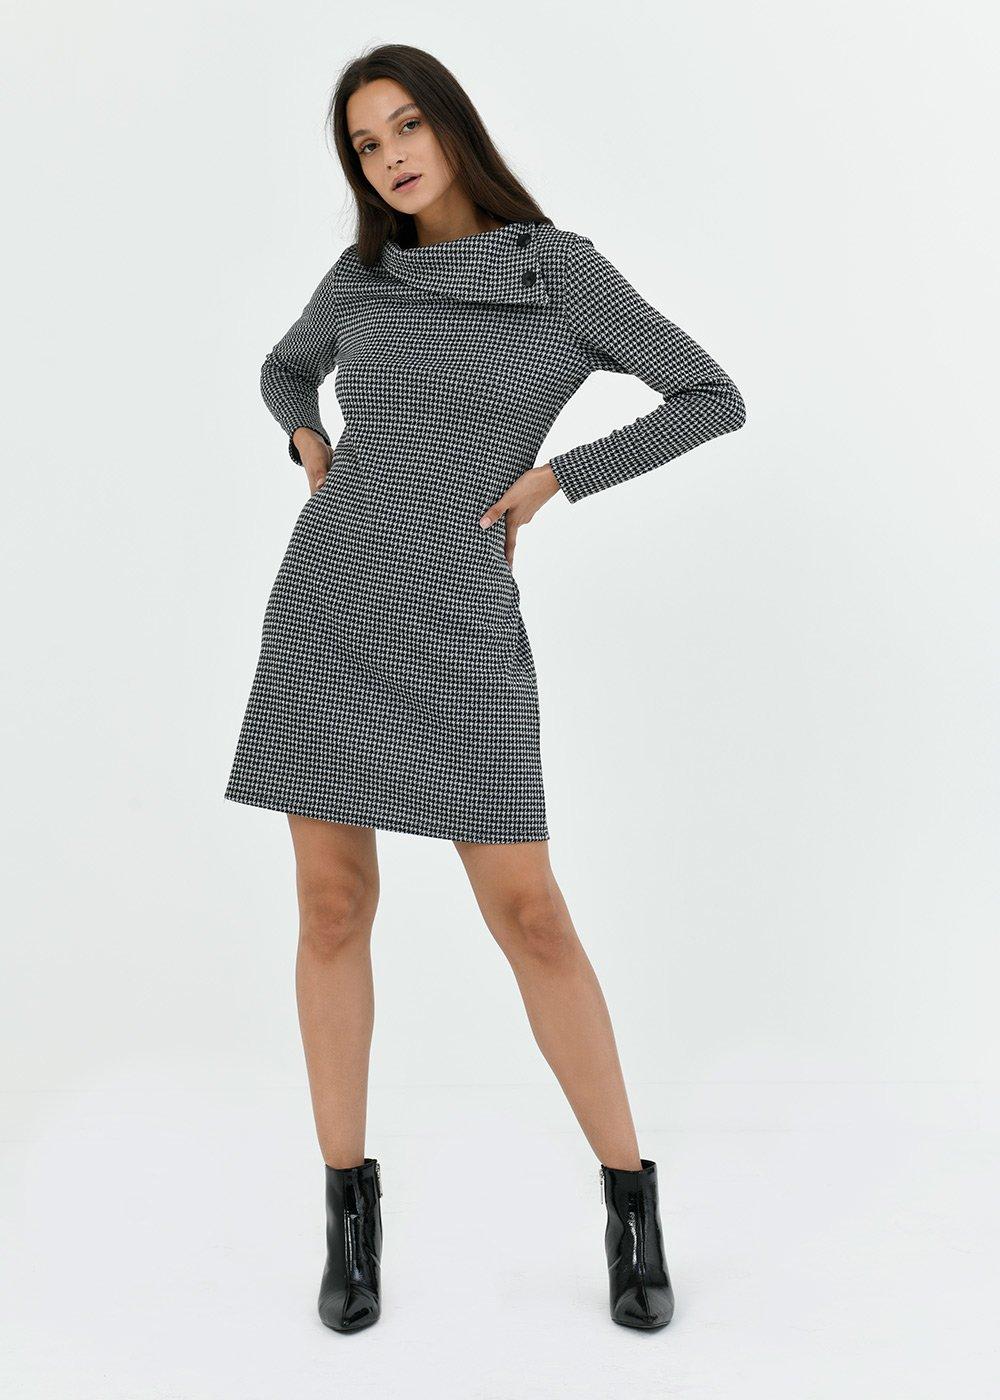 Arold jacquard dress - Black  / Grey Multi - Woman